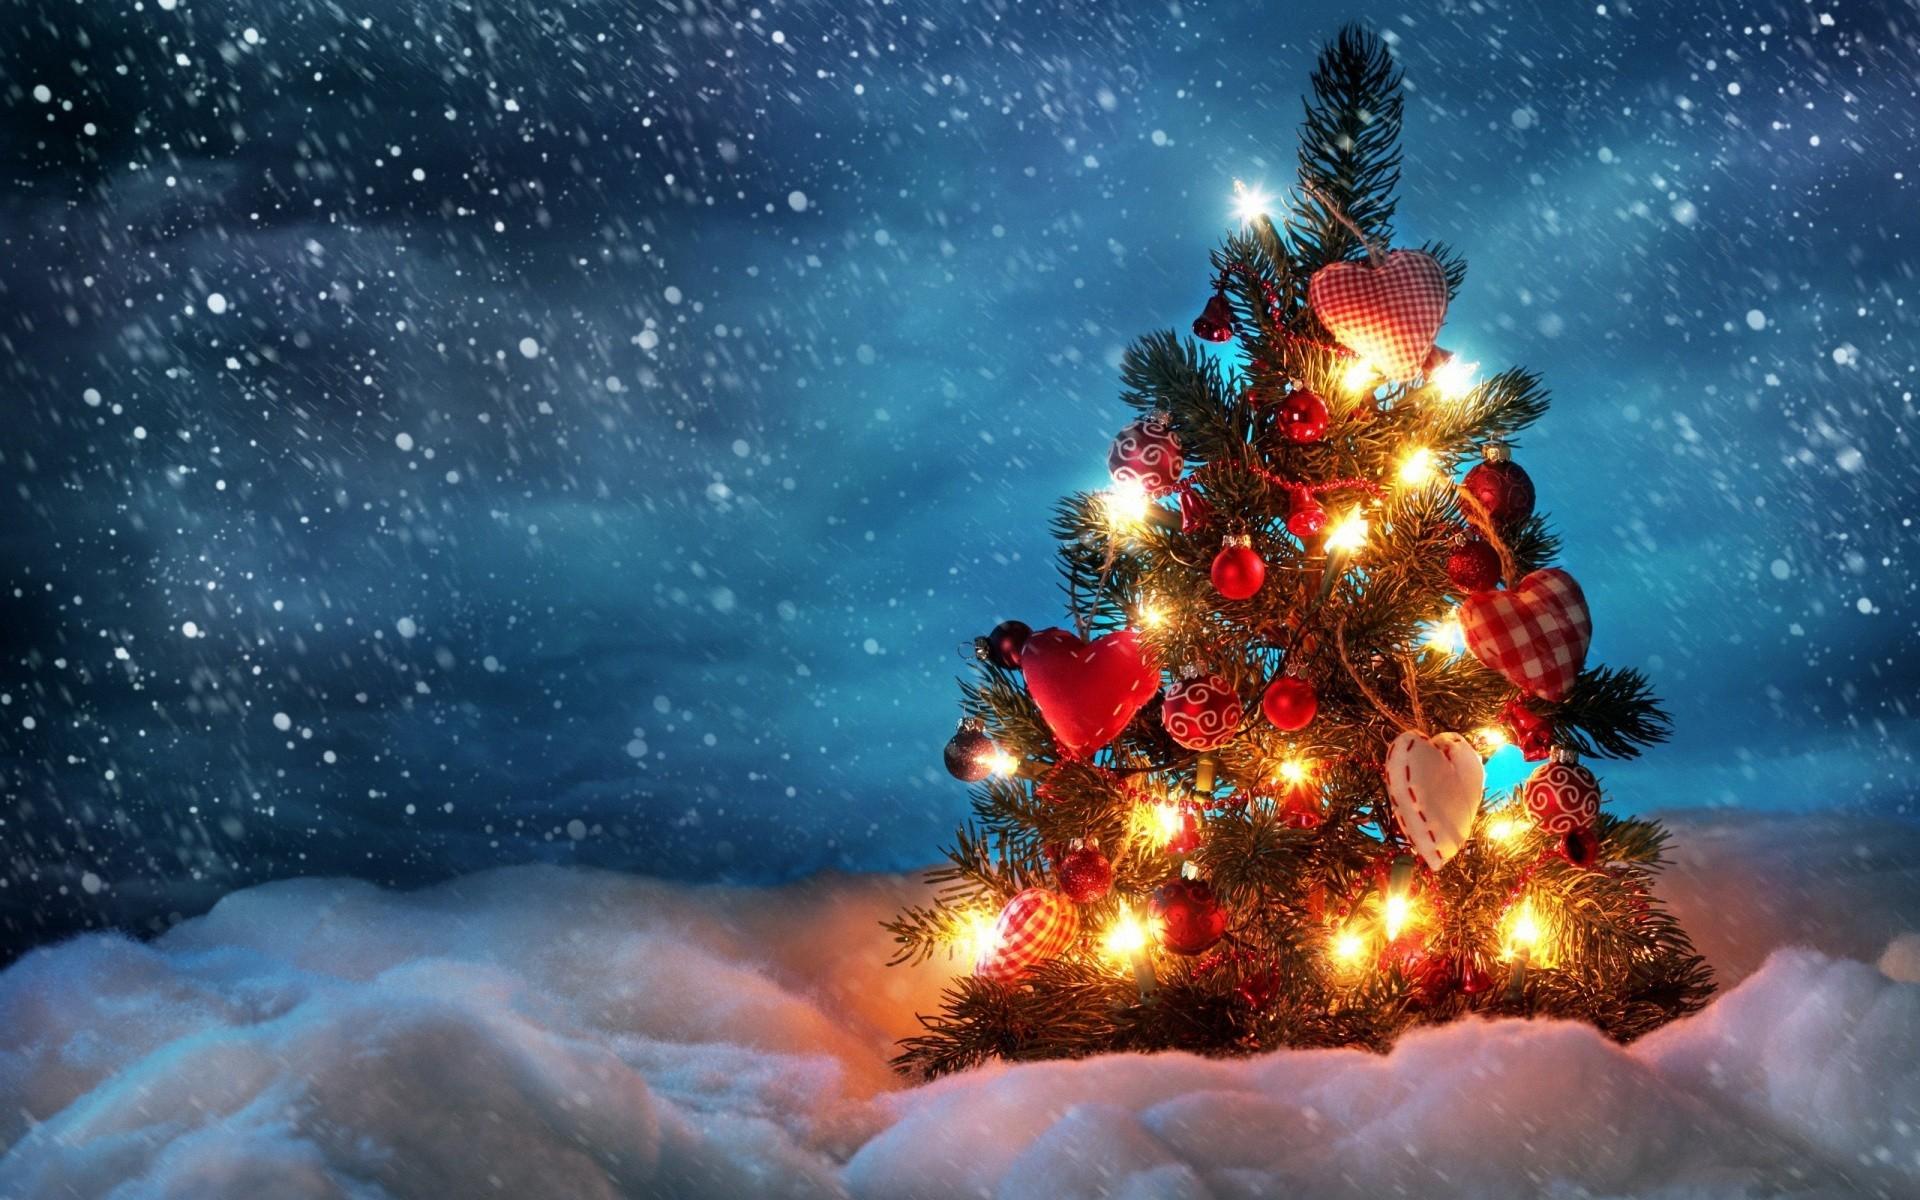 Beautiful Christmas Tree 2016 wallpapers (69 Wallpapers)